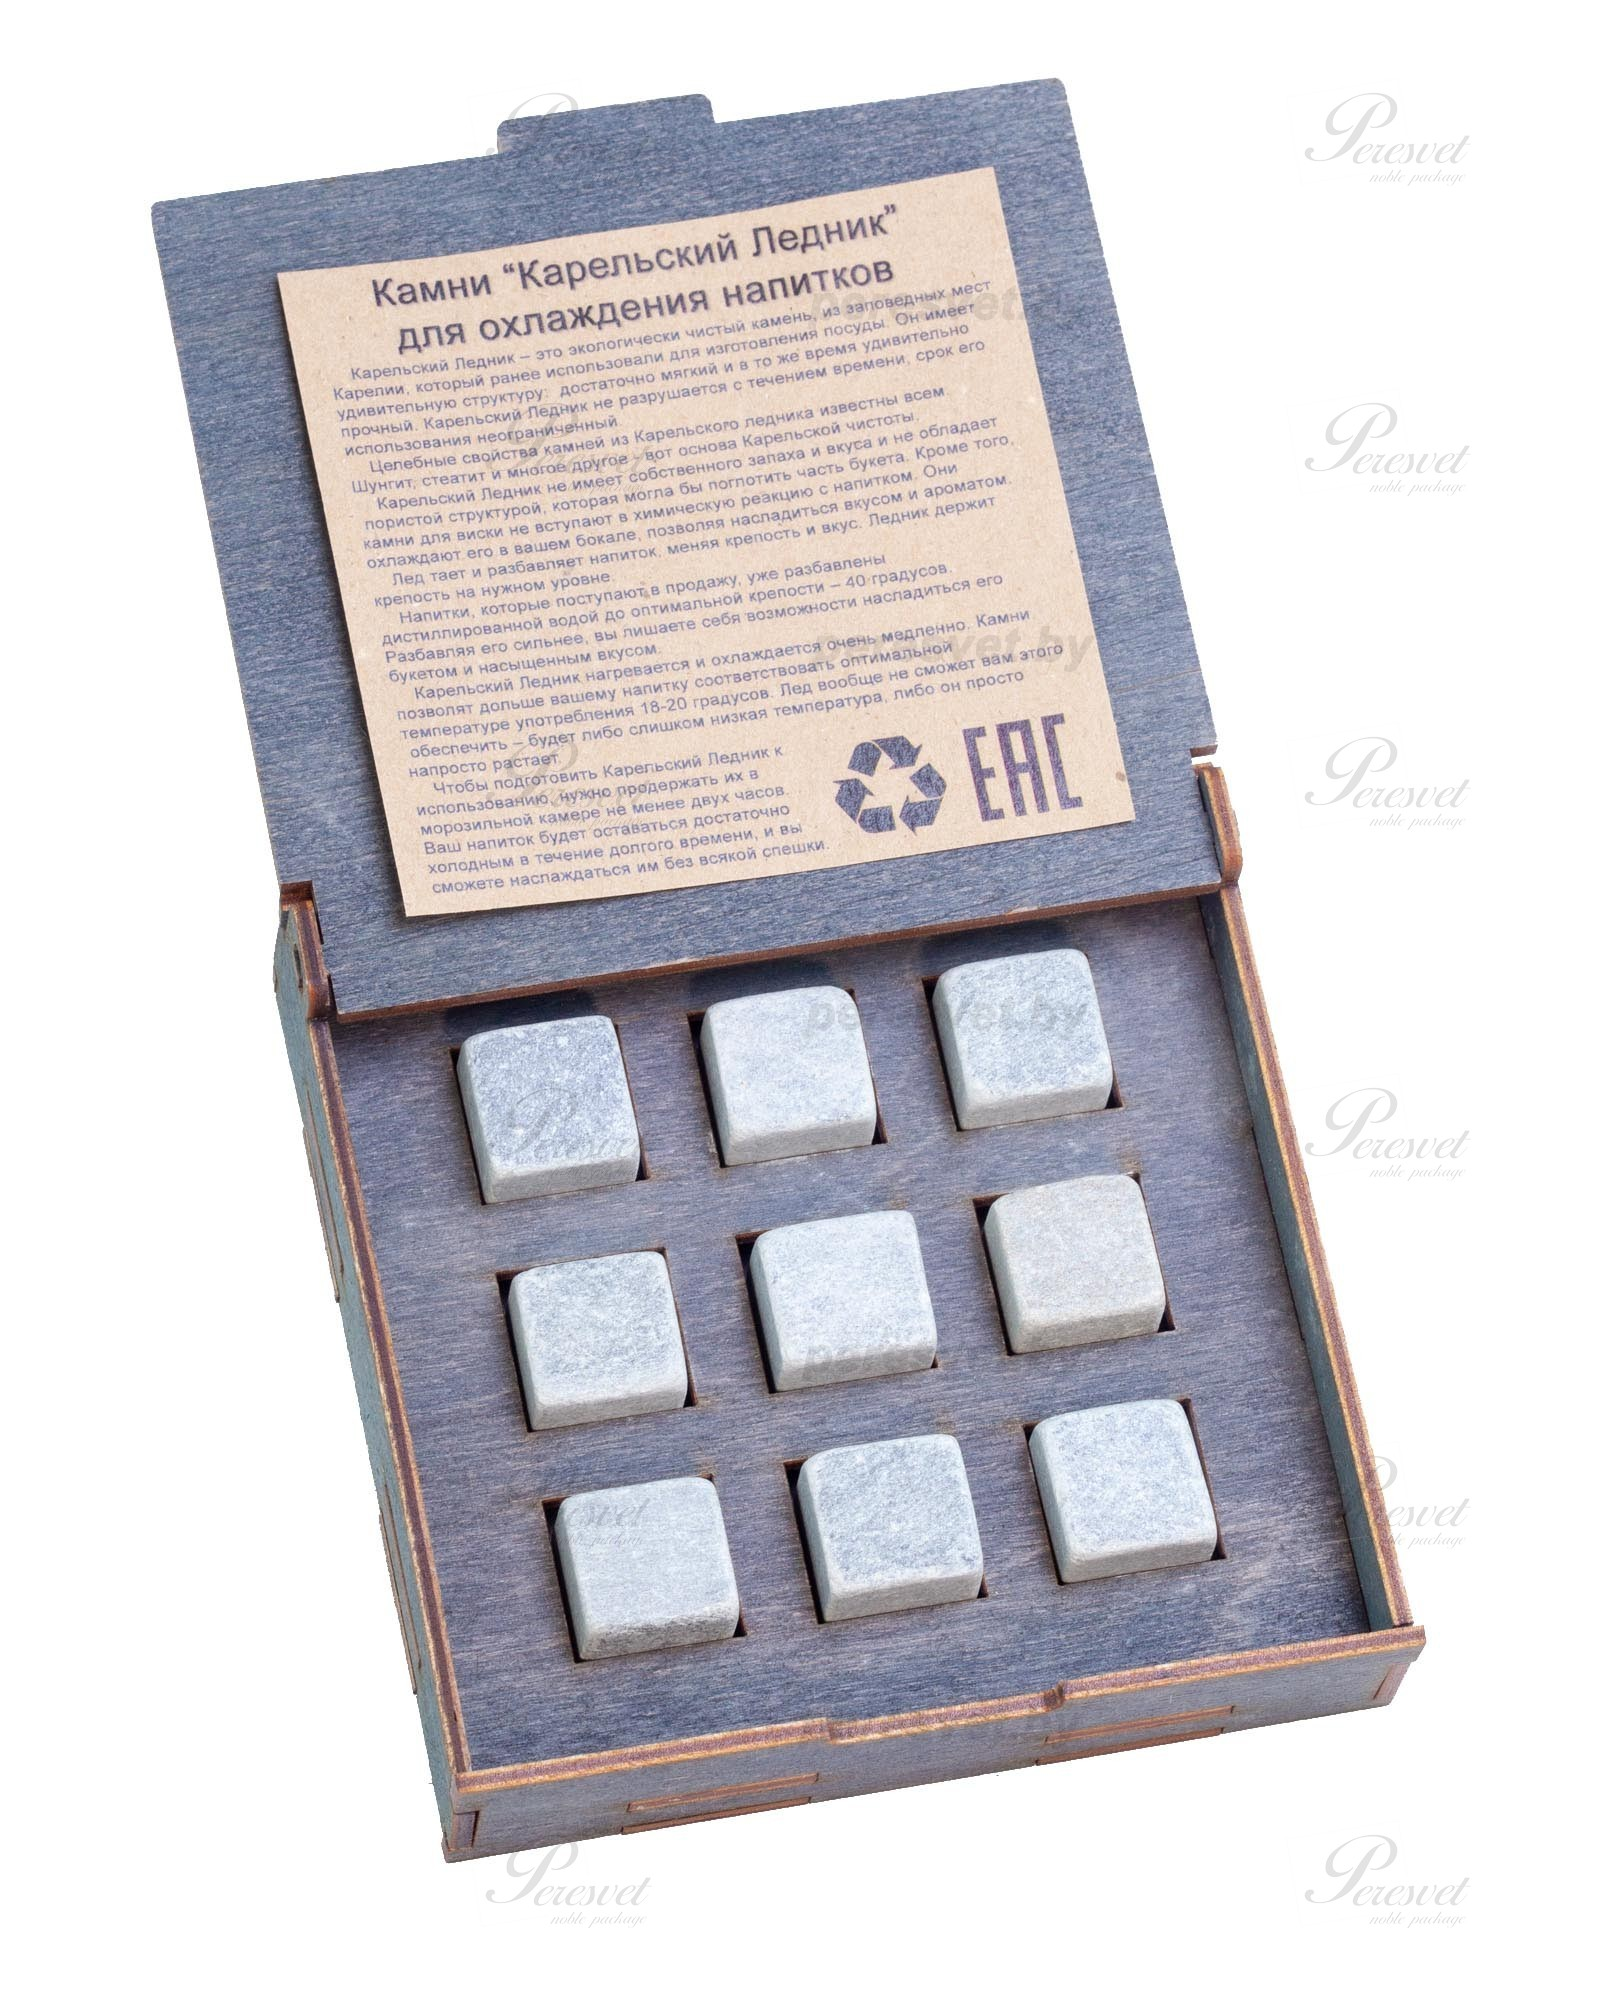 Мужской набор камней для виски в подарок на peresvet.by